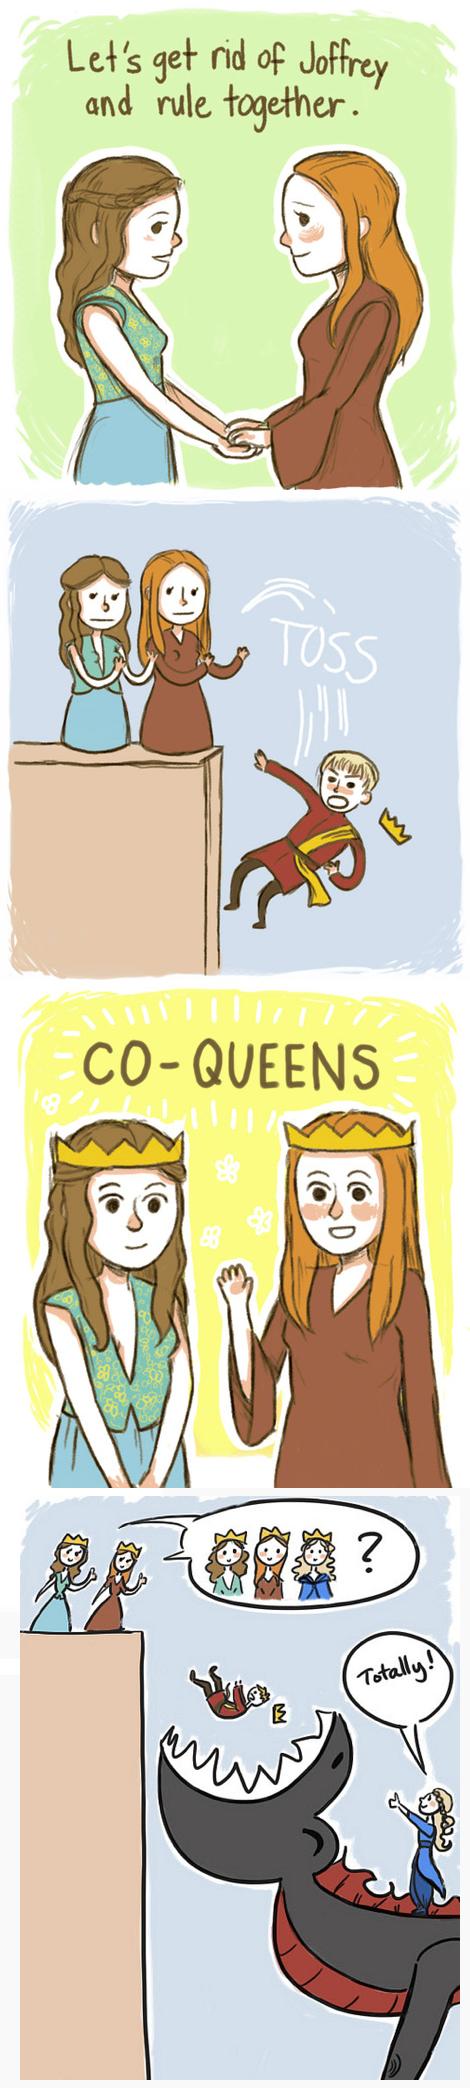 How-I-Imagine-Joffrey-Losing1